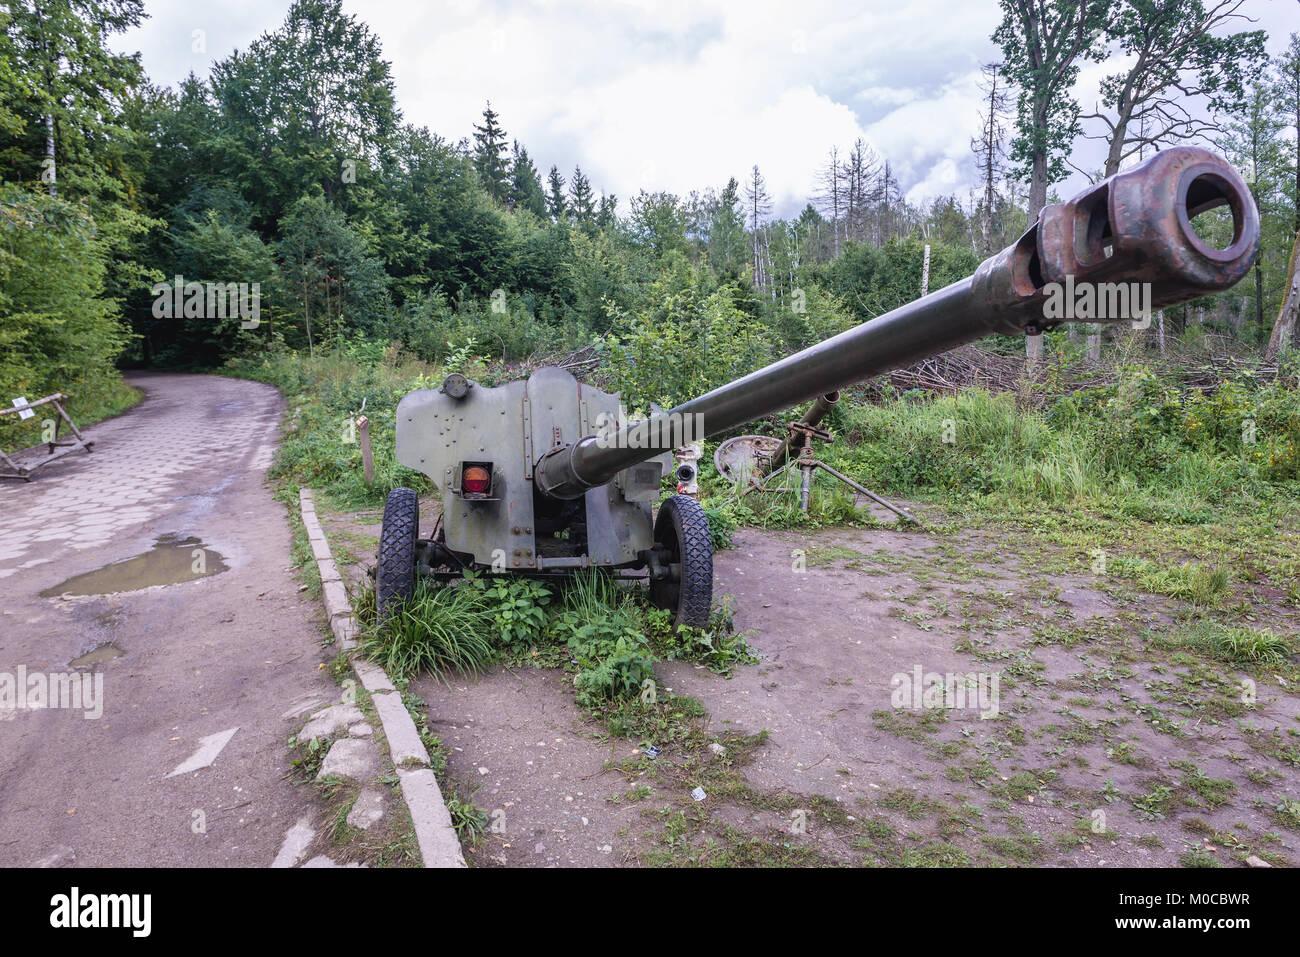 85 mm divisional gun D-44